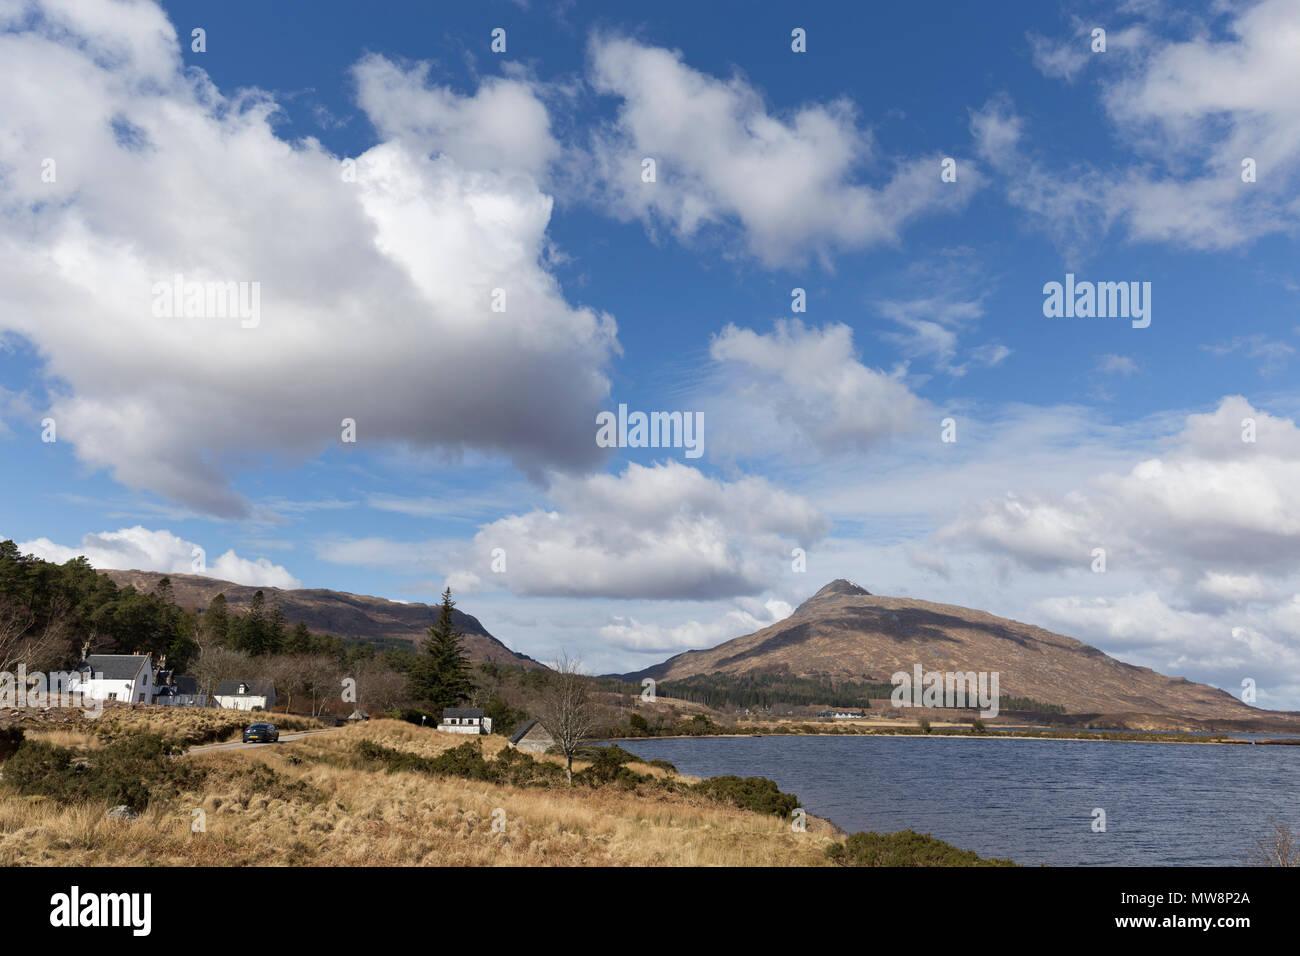 Hamlet of Achfary next to Loch More, Sutherland - Stock Image